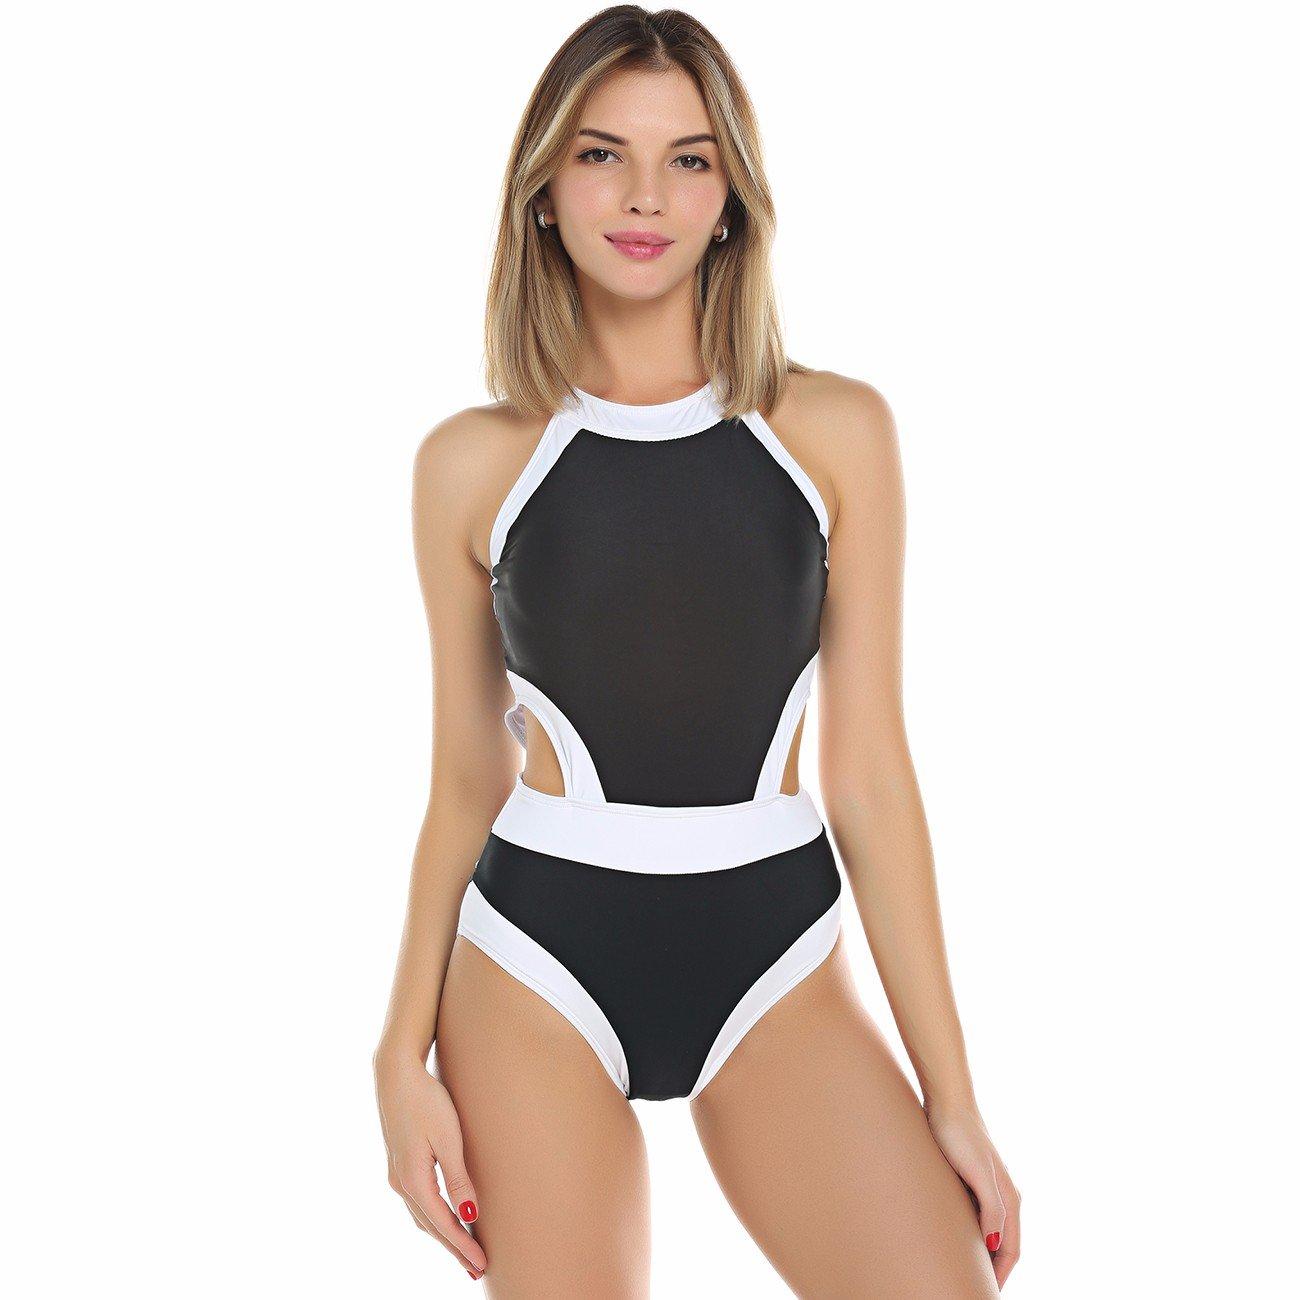 e6406b9e7a KIWI RATA 2018 New Women One Piece Bandage Style Swimsuit Padded Push Up  Backless Monokini Bathing Bikini Swimwear at Amazon Women's Clothing store: